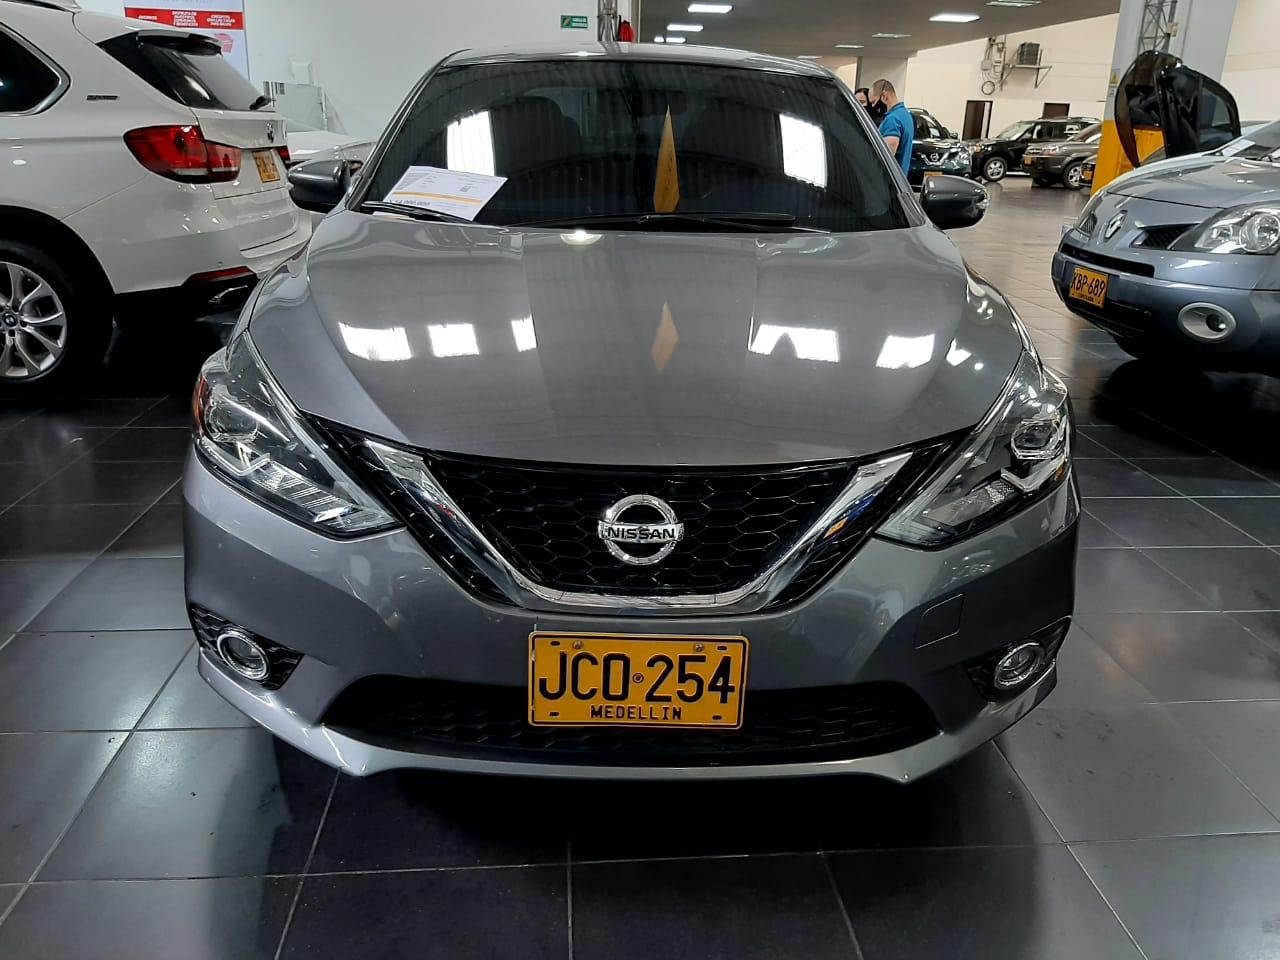 Nissan-Sentra-01473149-1